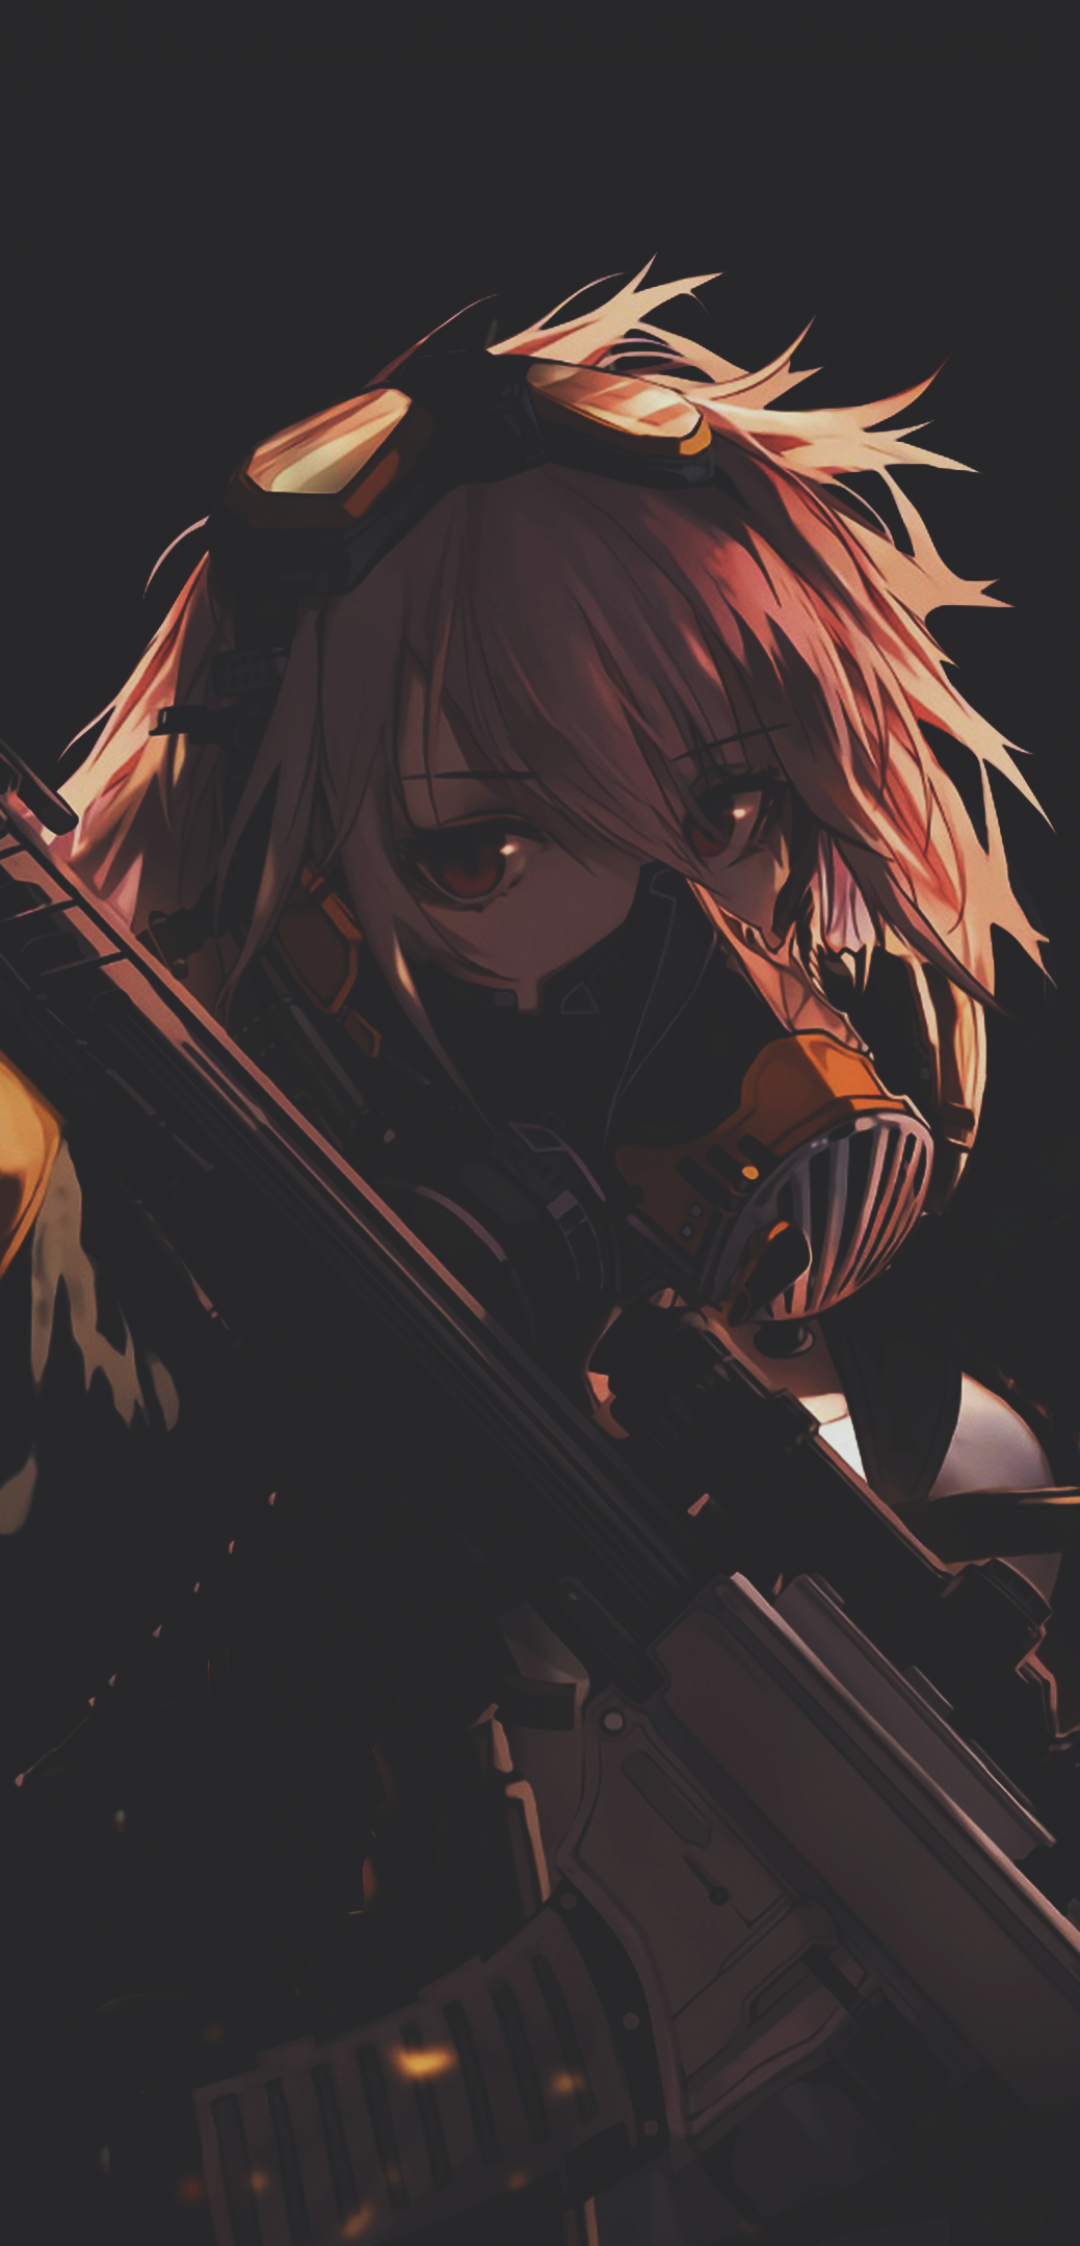 Dark Anime Phone 1080X2246 Wallpapers - Wallpaper Cave